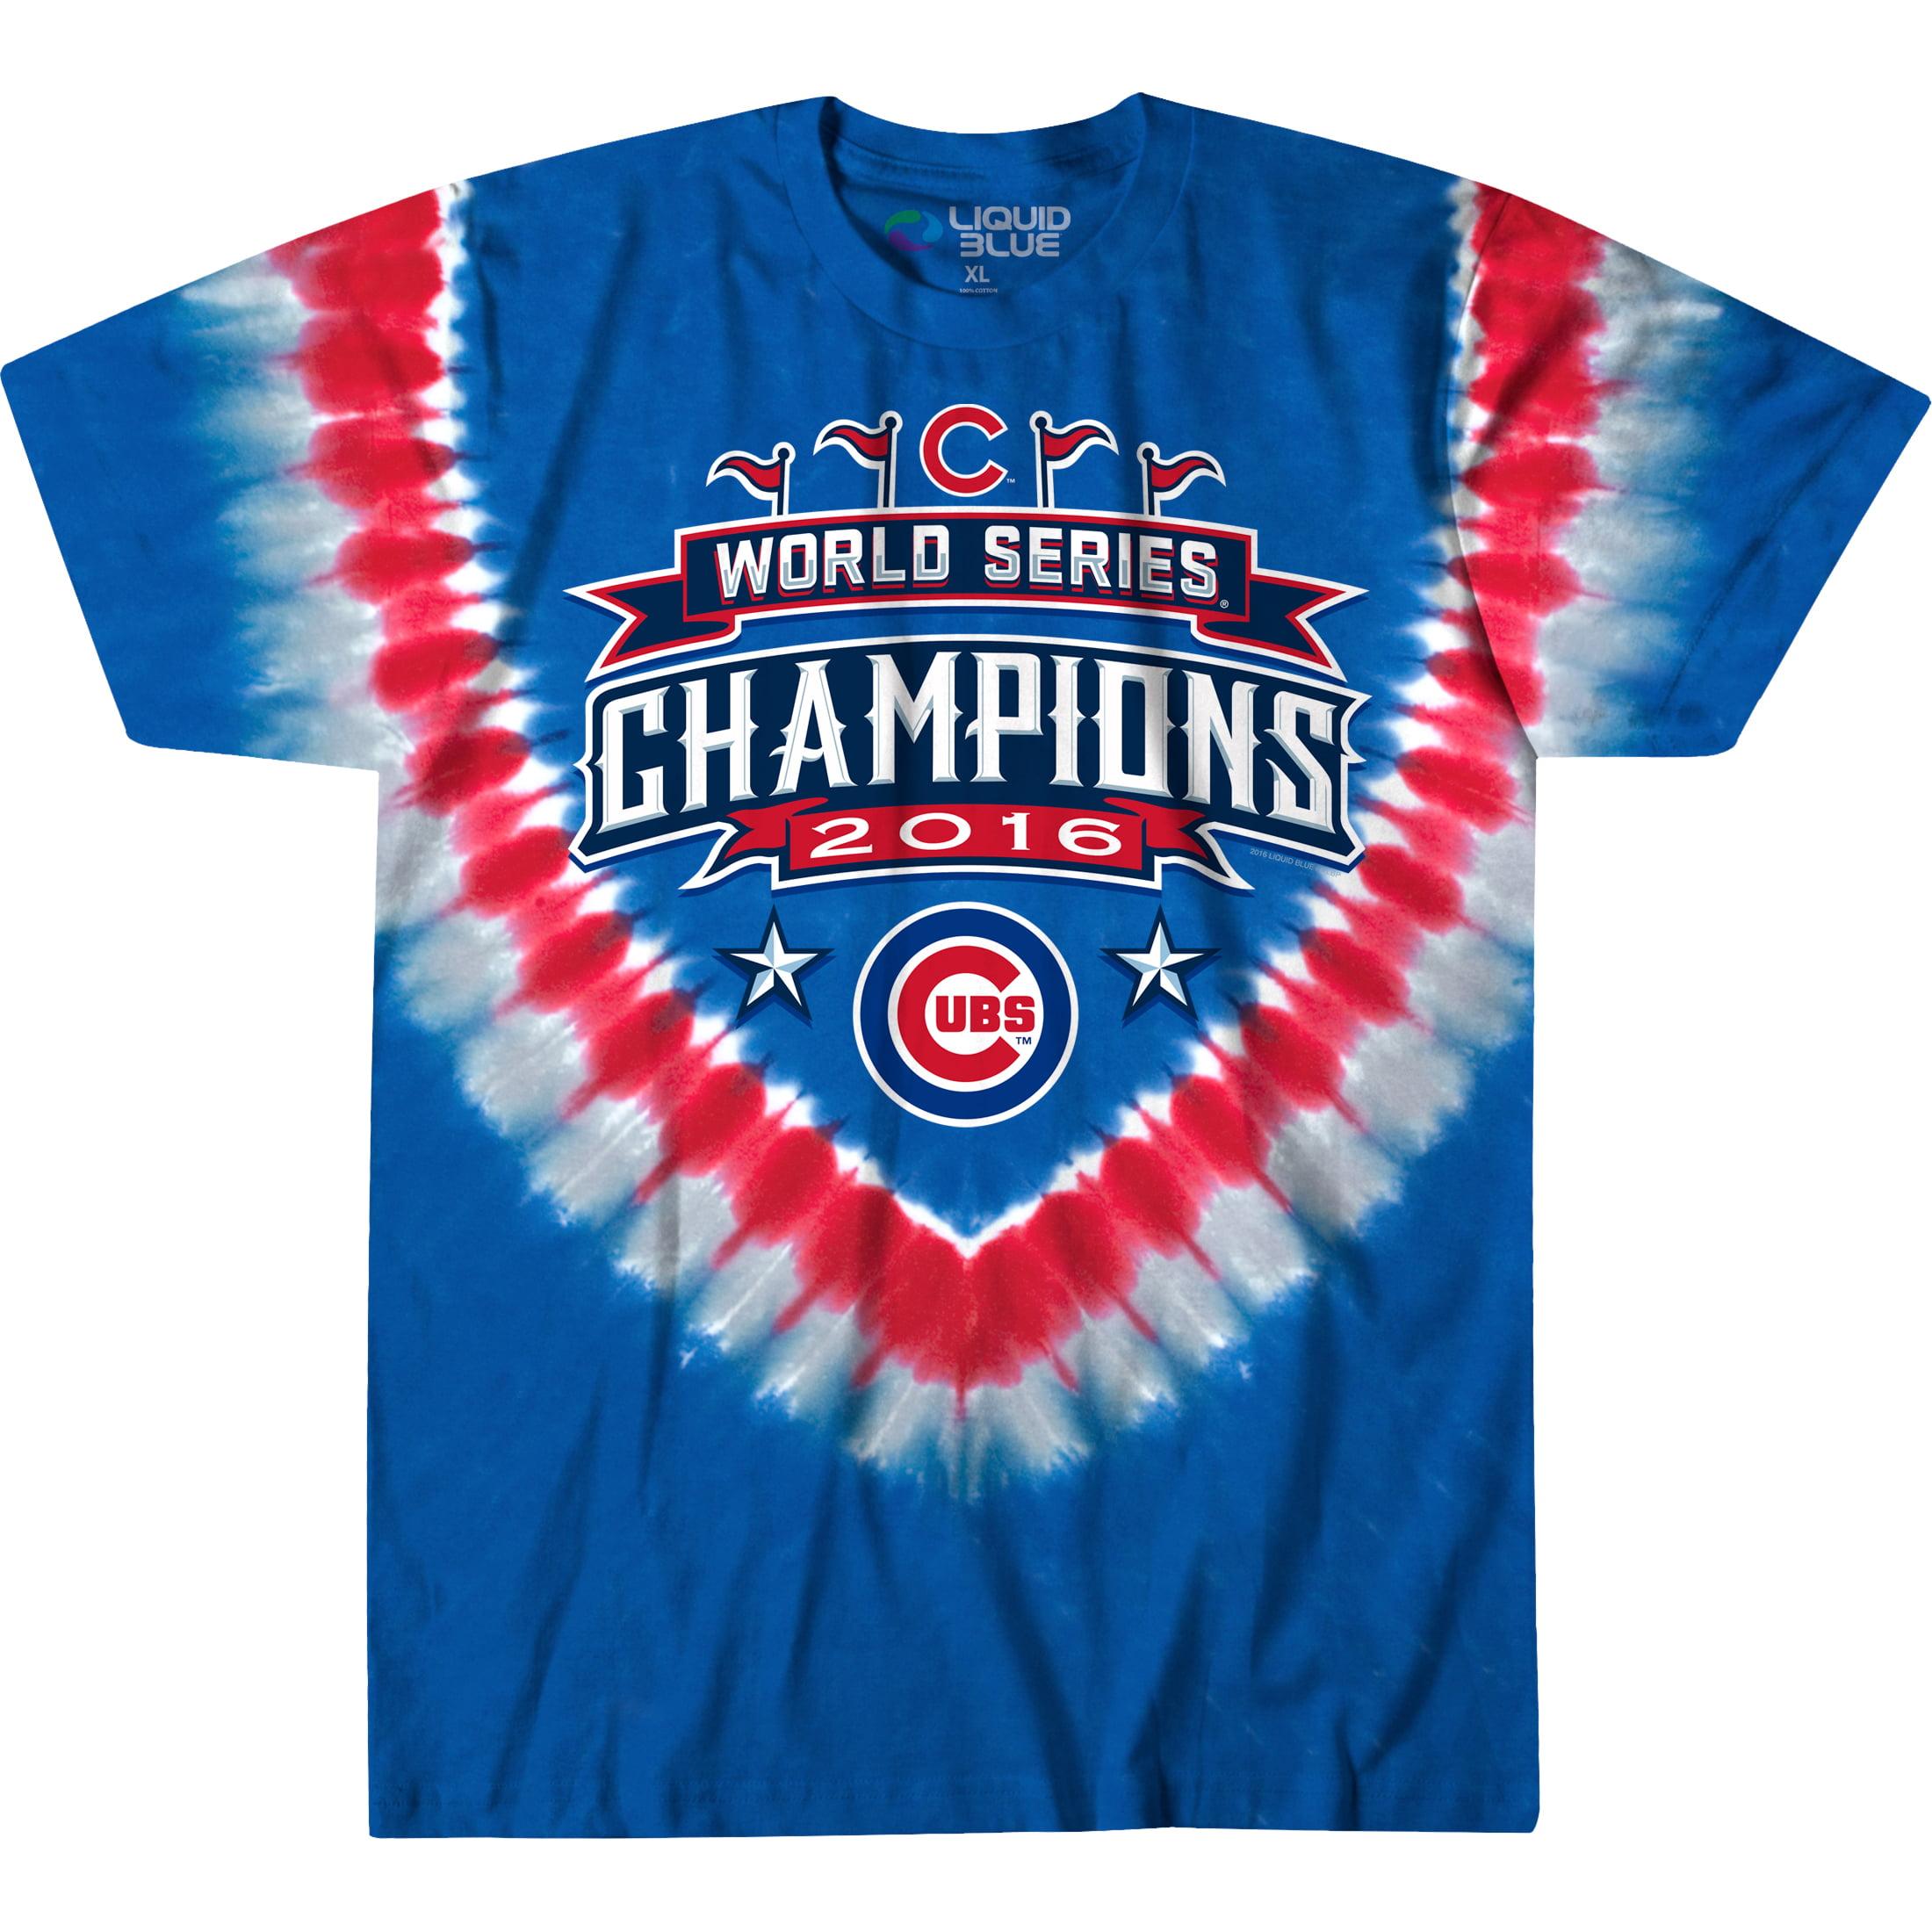 Men's Multi Chicago Cubs 2016 World Series Champions Tie-Dye T-Shirt